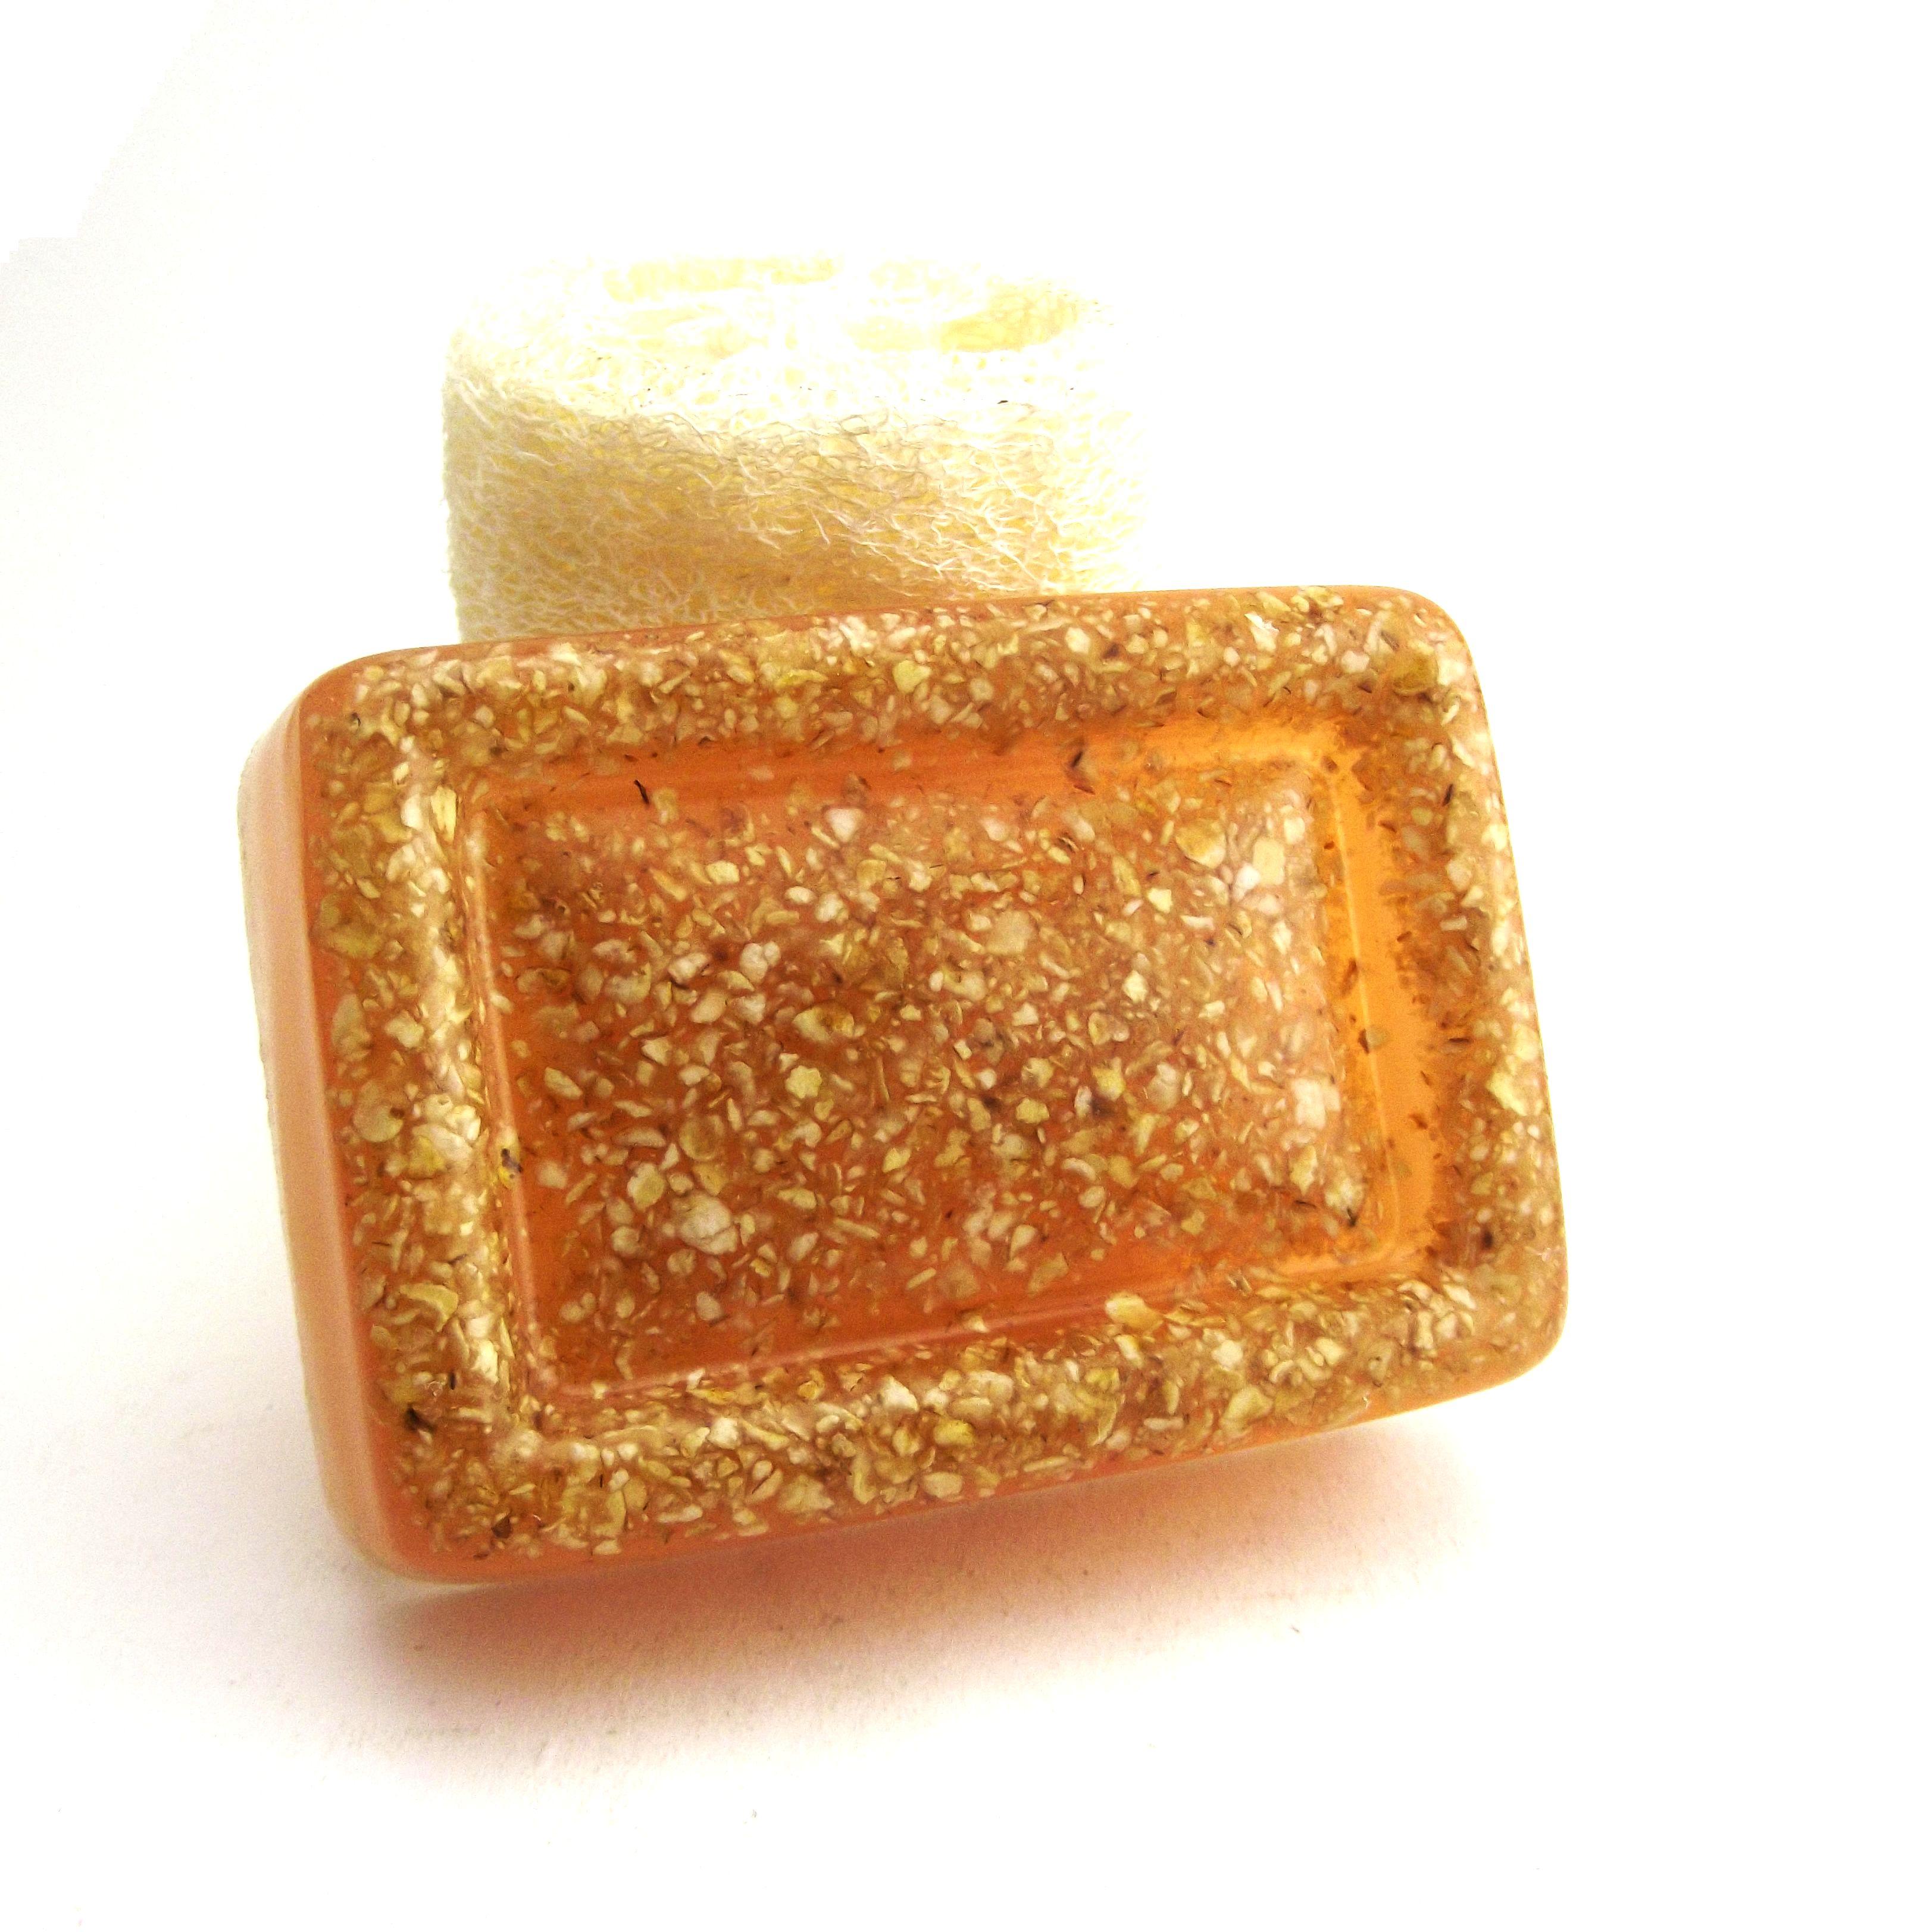 Oatmeal And Honey Soap Bar 4 Oz on Luulla